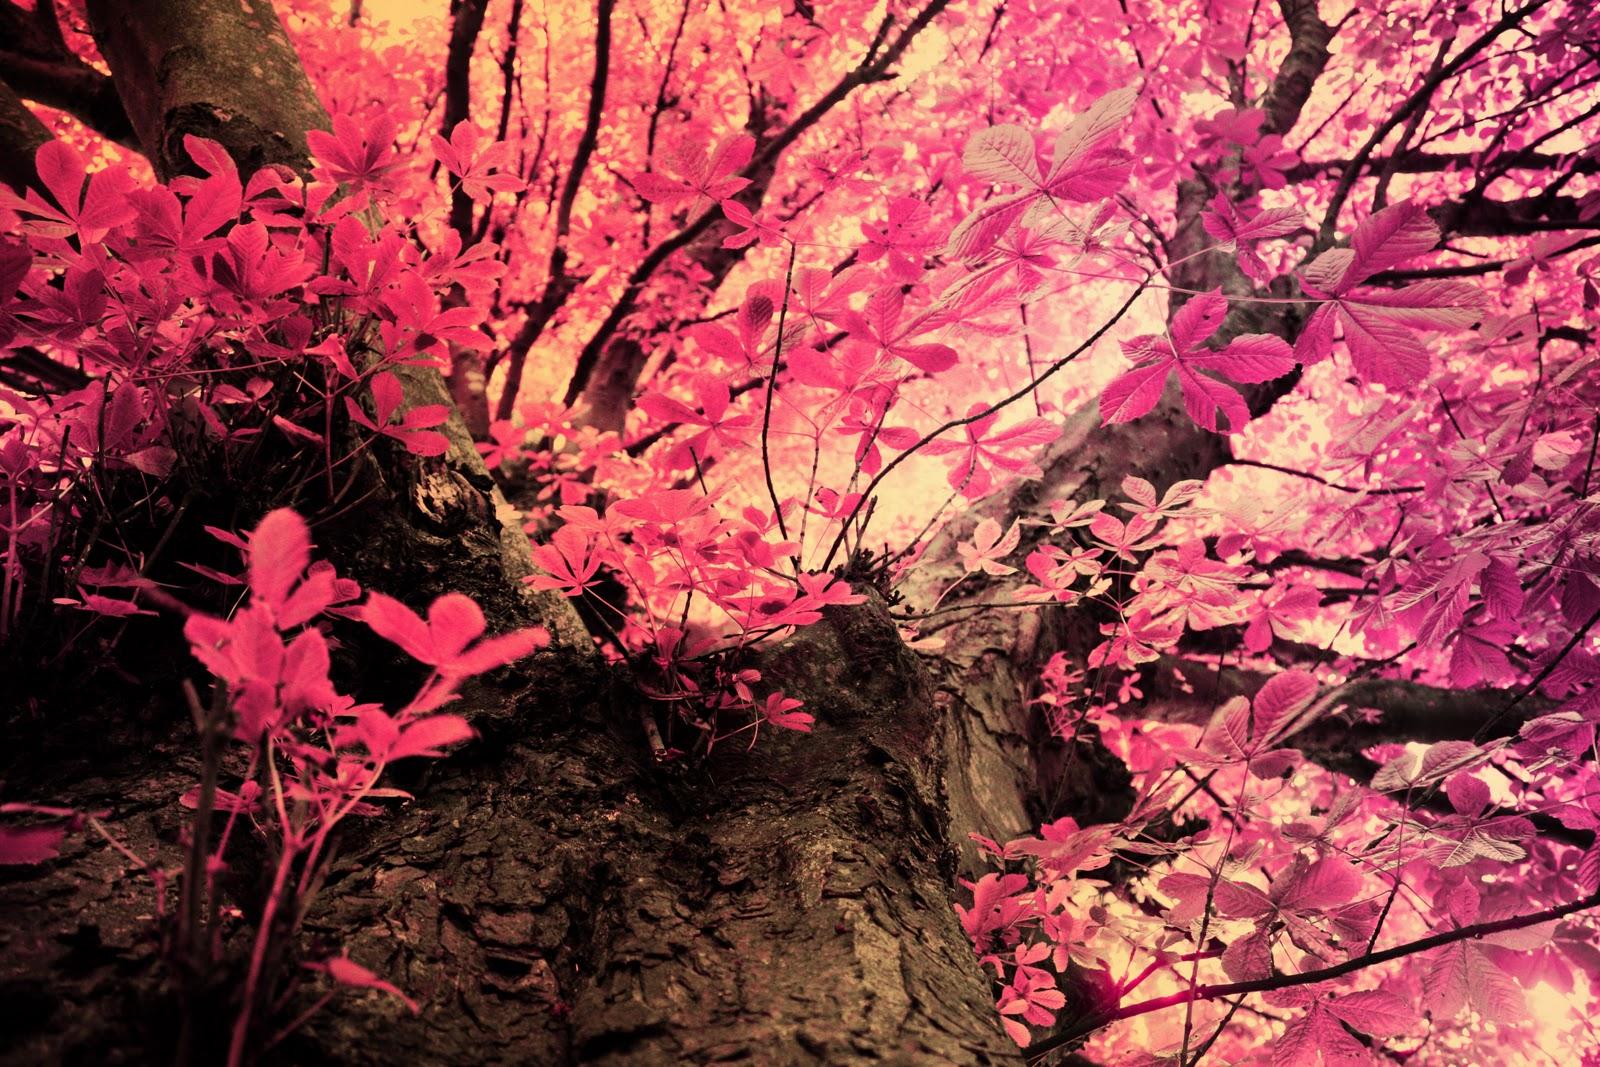 Pink mossy oak wallpaper fashionable pink leaves